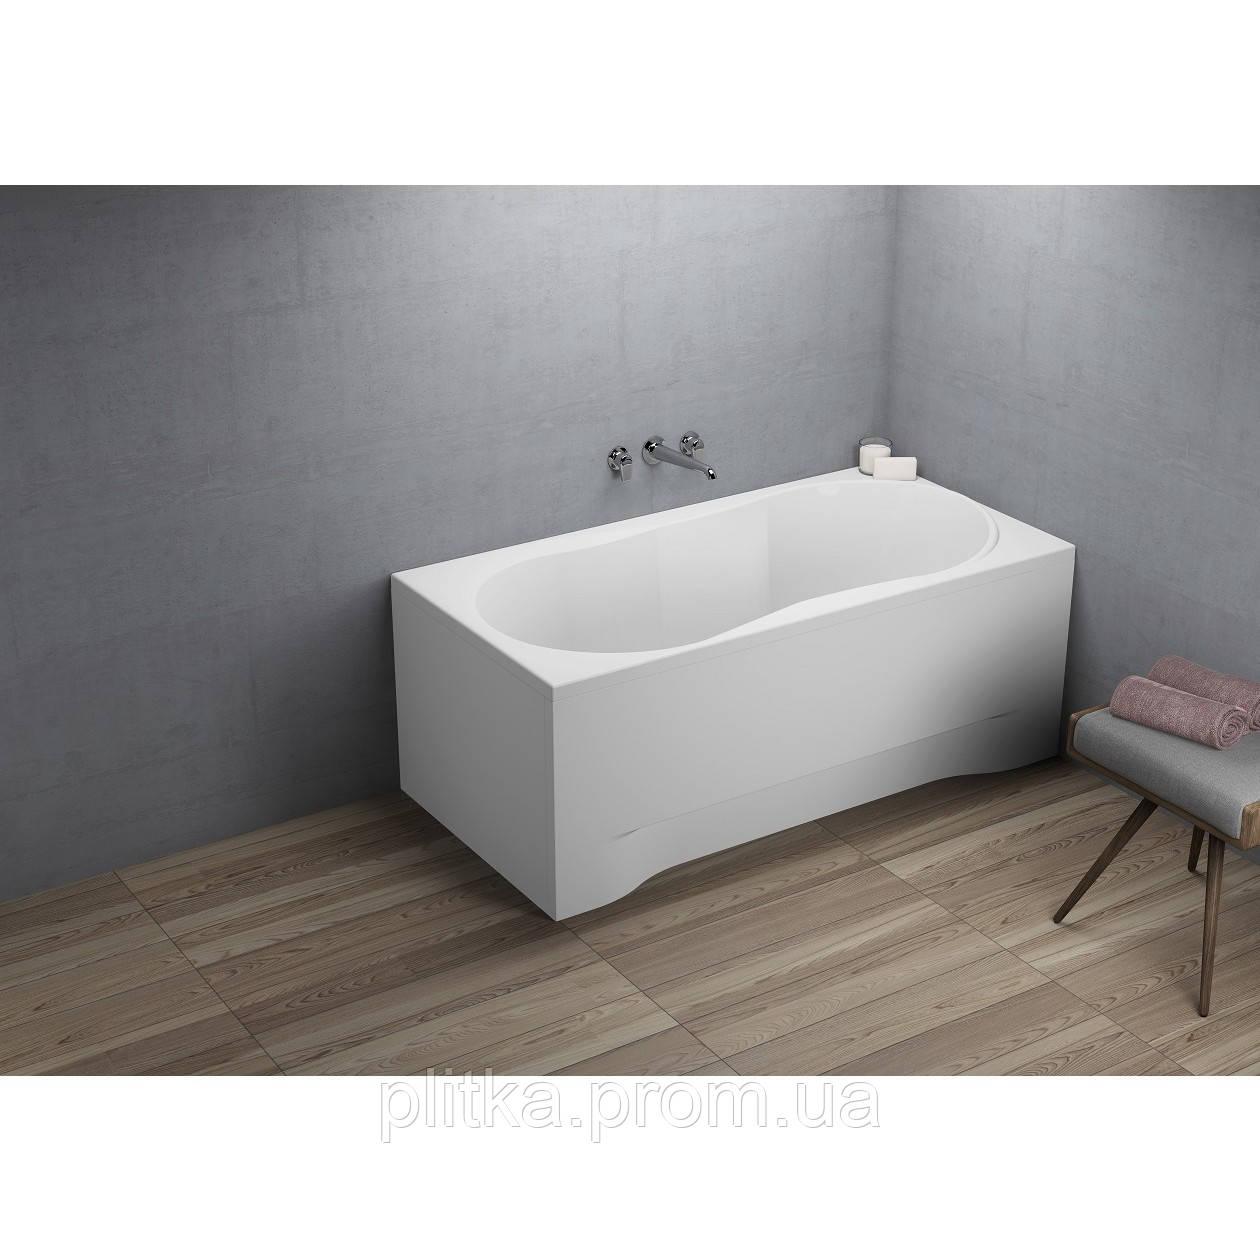 Ванна прямоугольная GRACJA 120x75